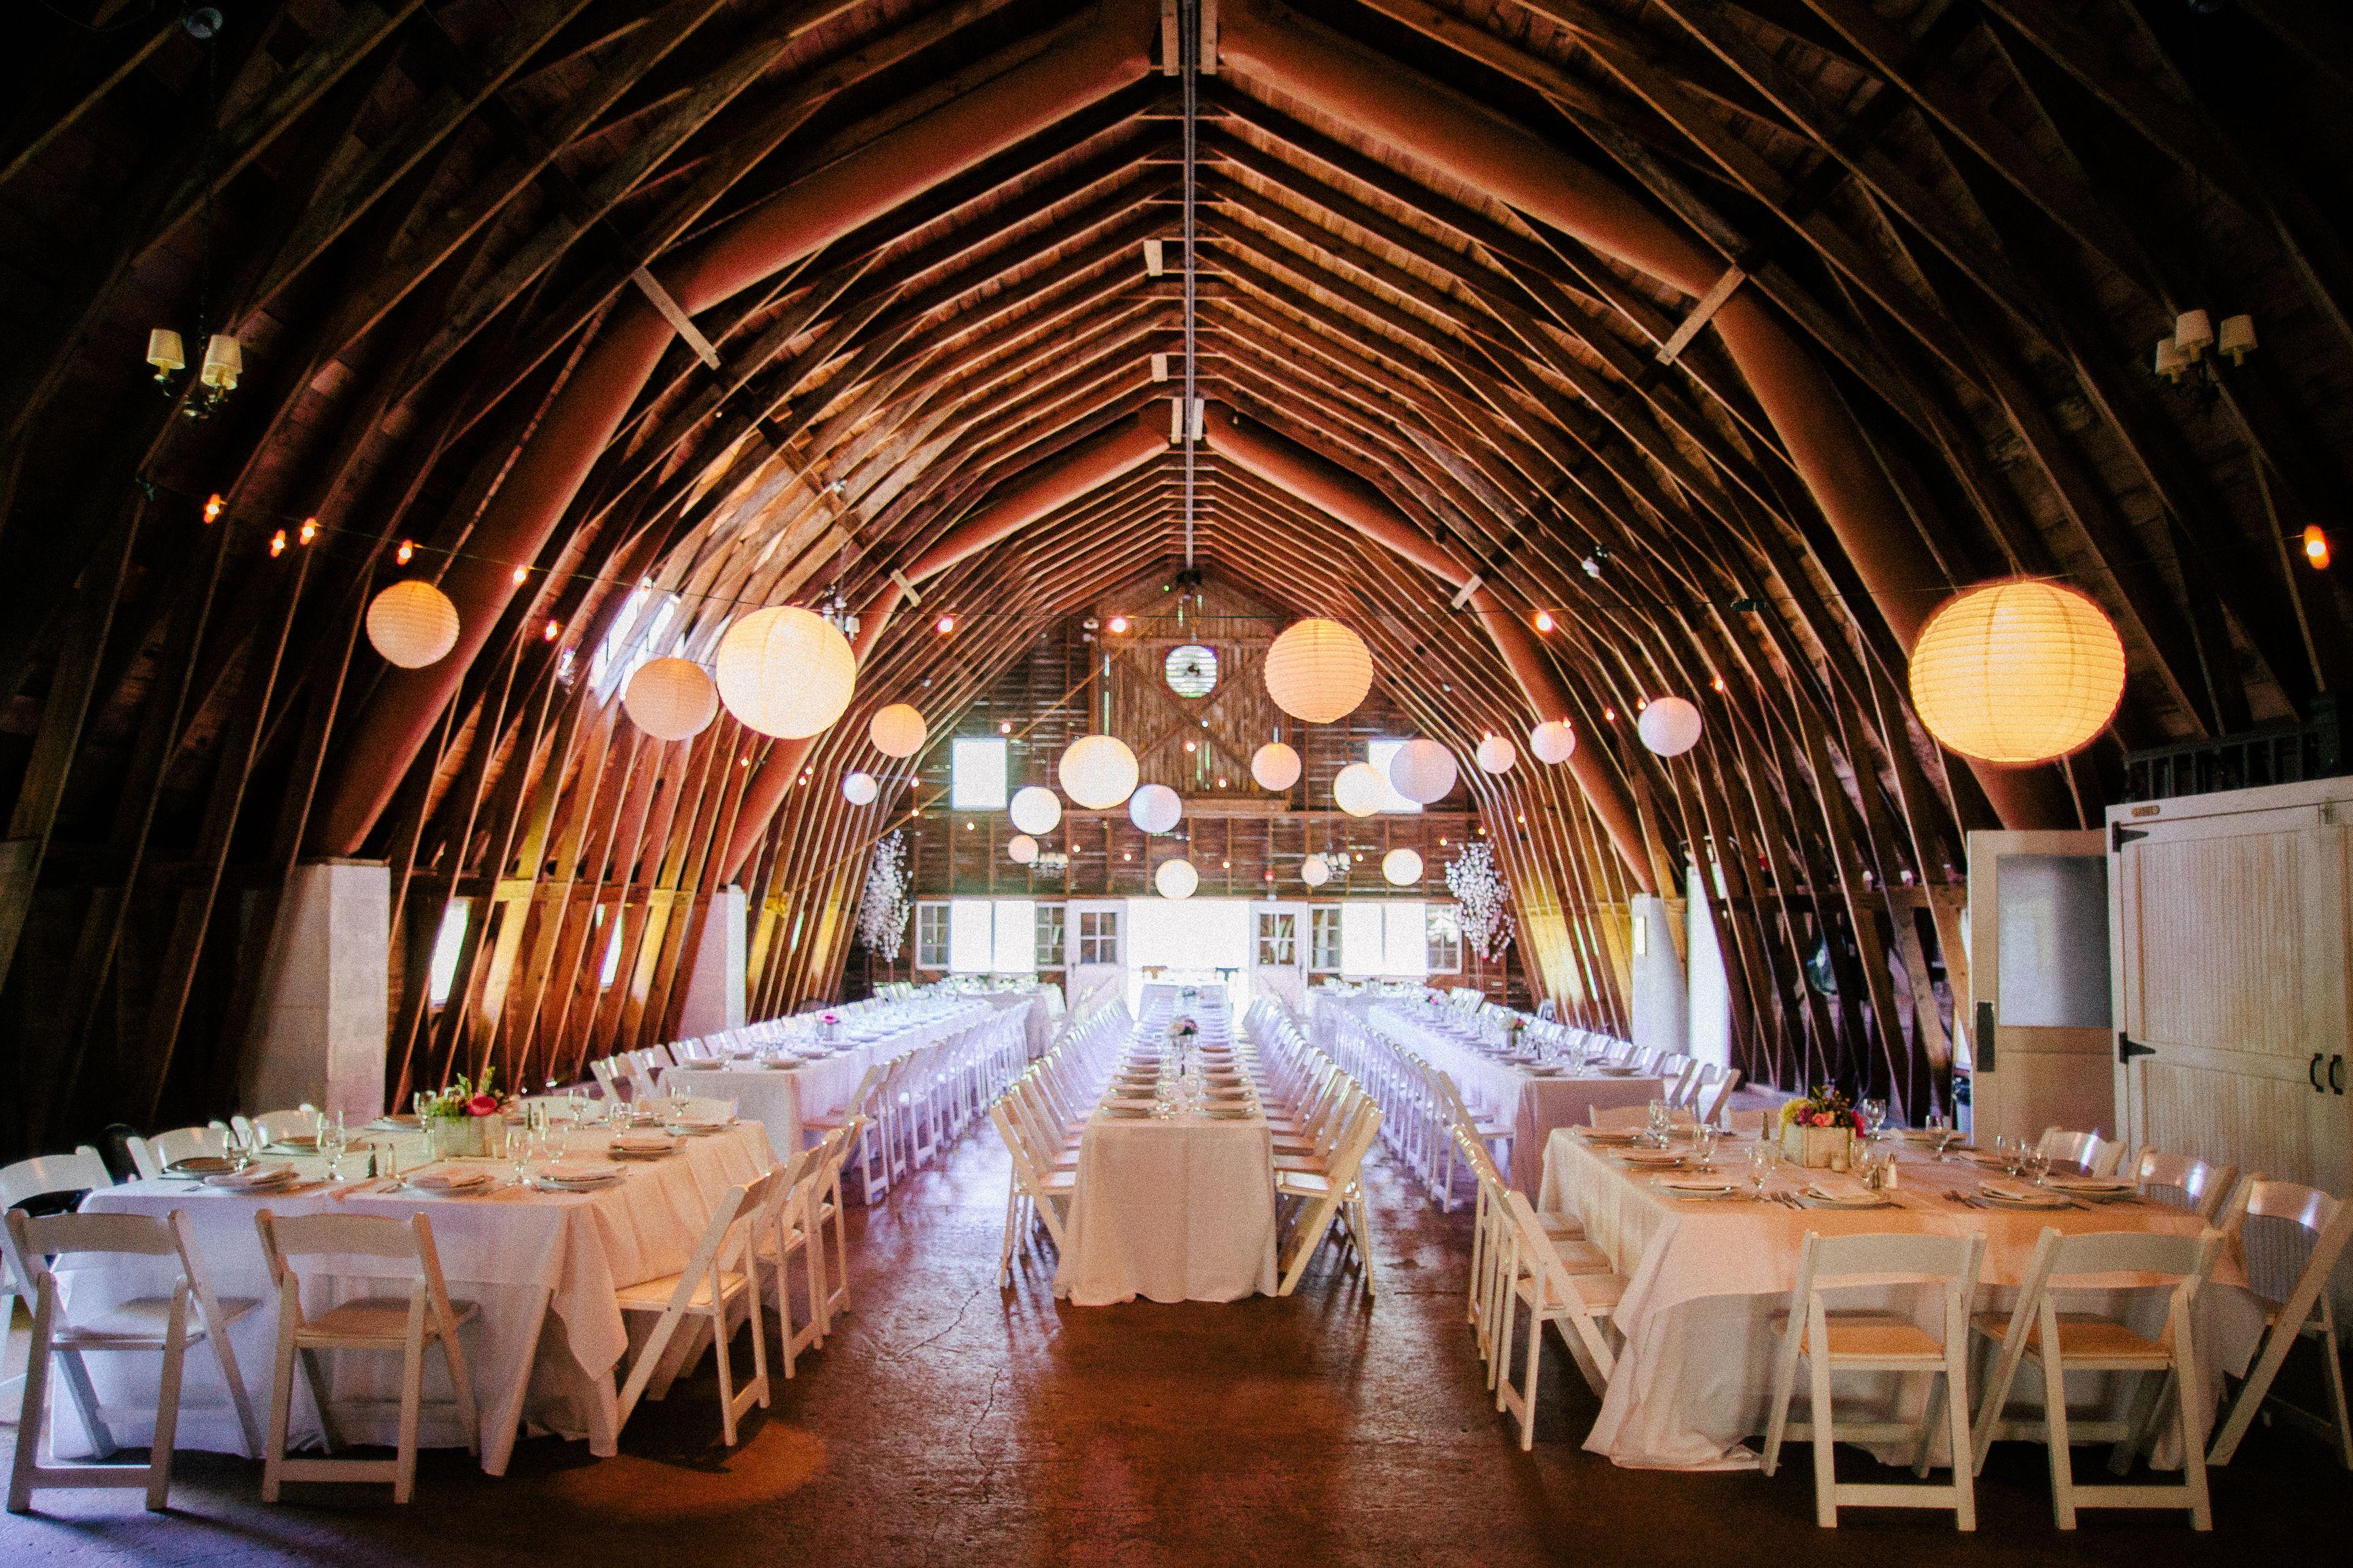 Barn wedding venue sw michigan with images barn